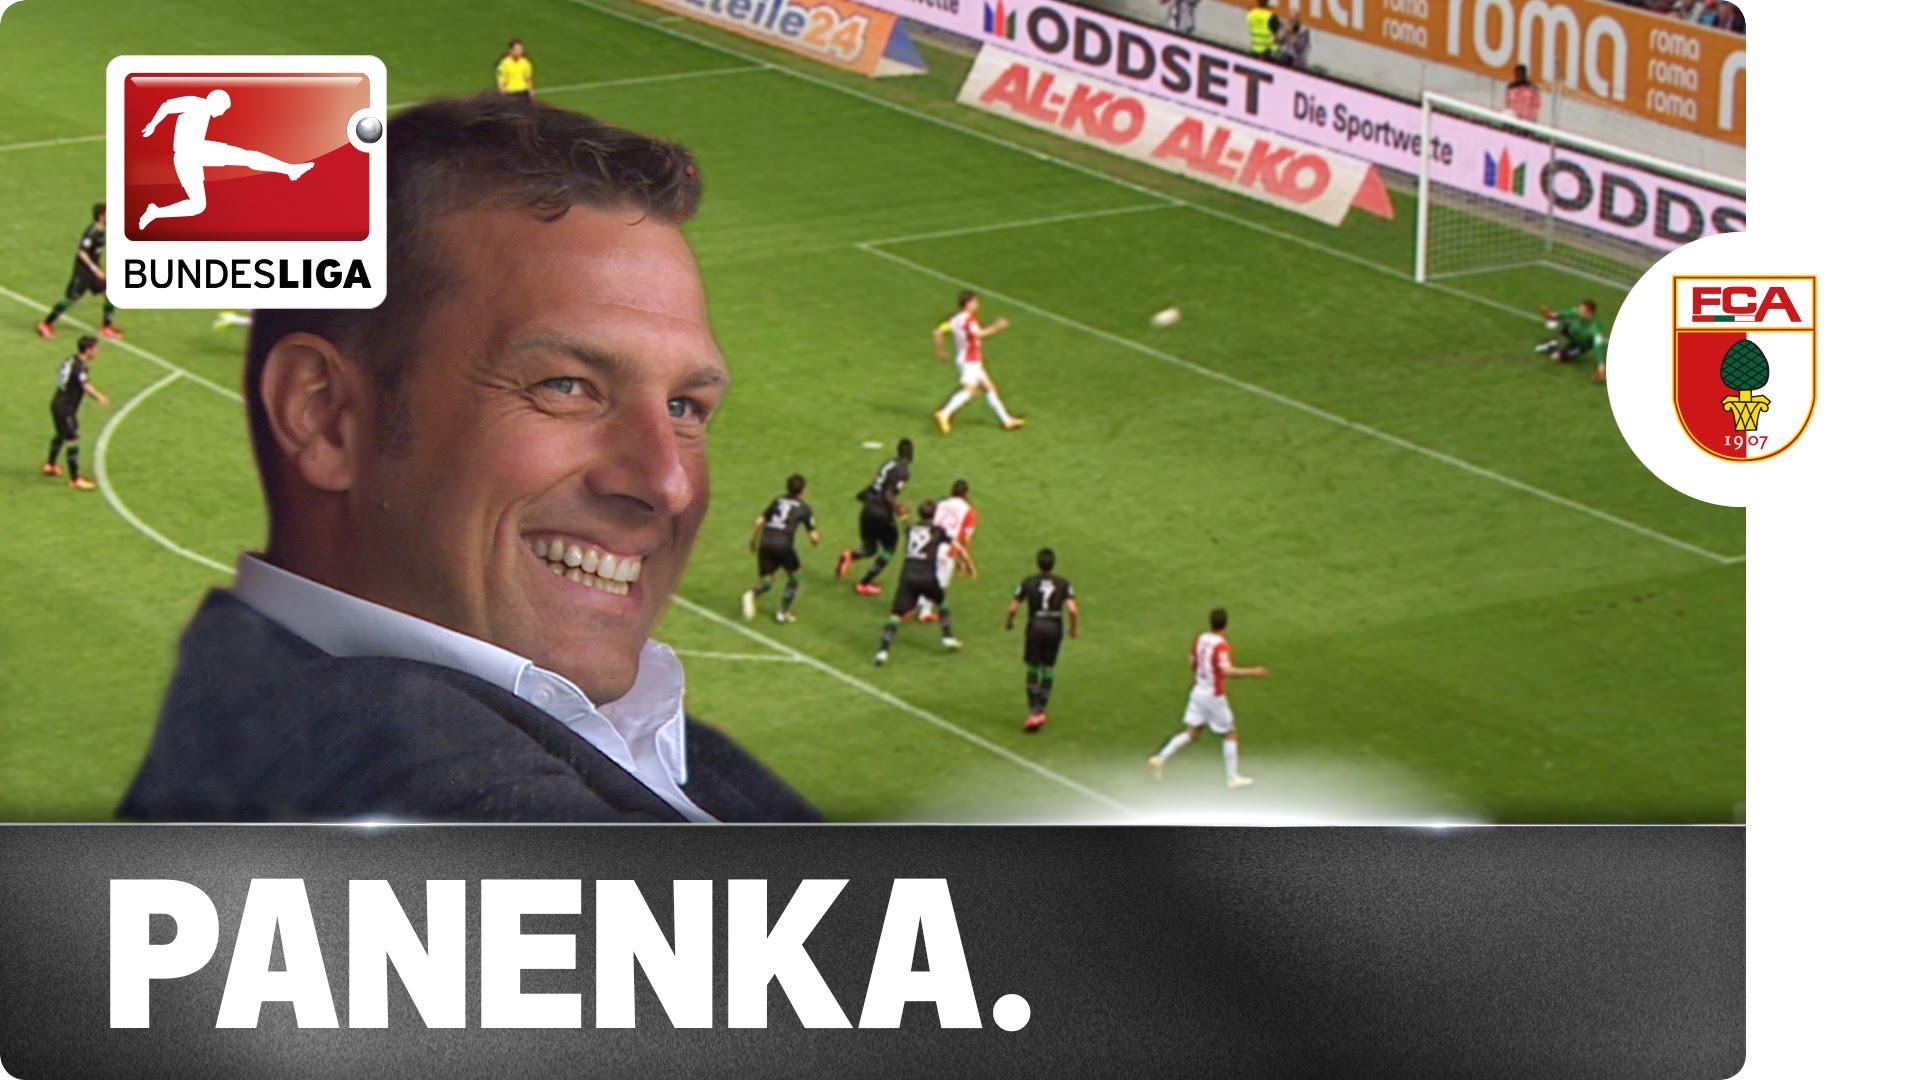 Augsburgo Verhaegh penalti Hannover